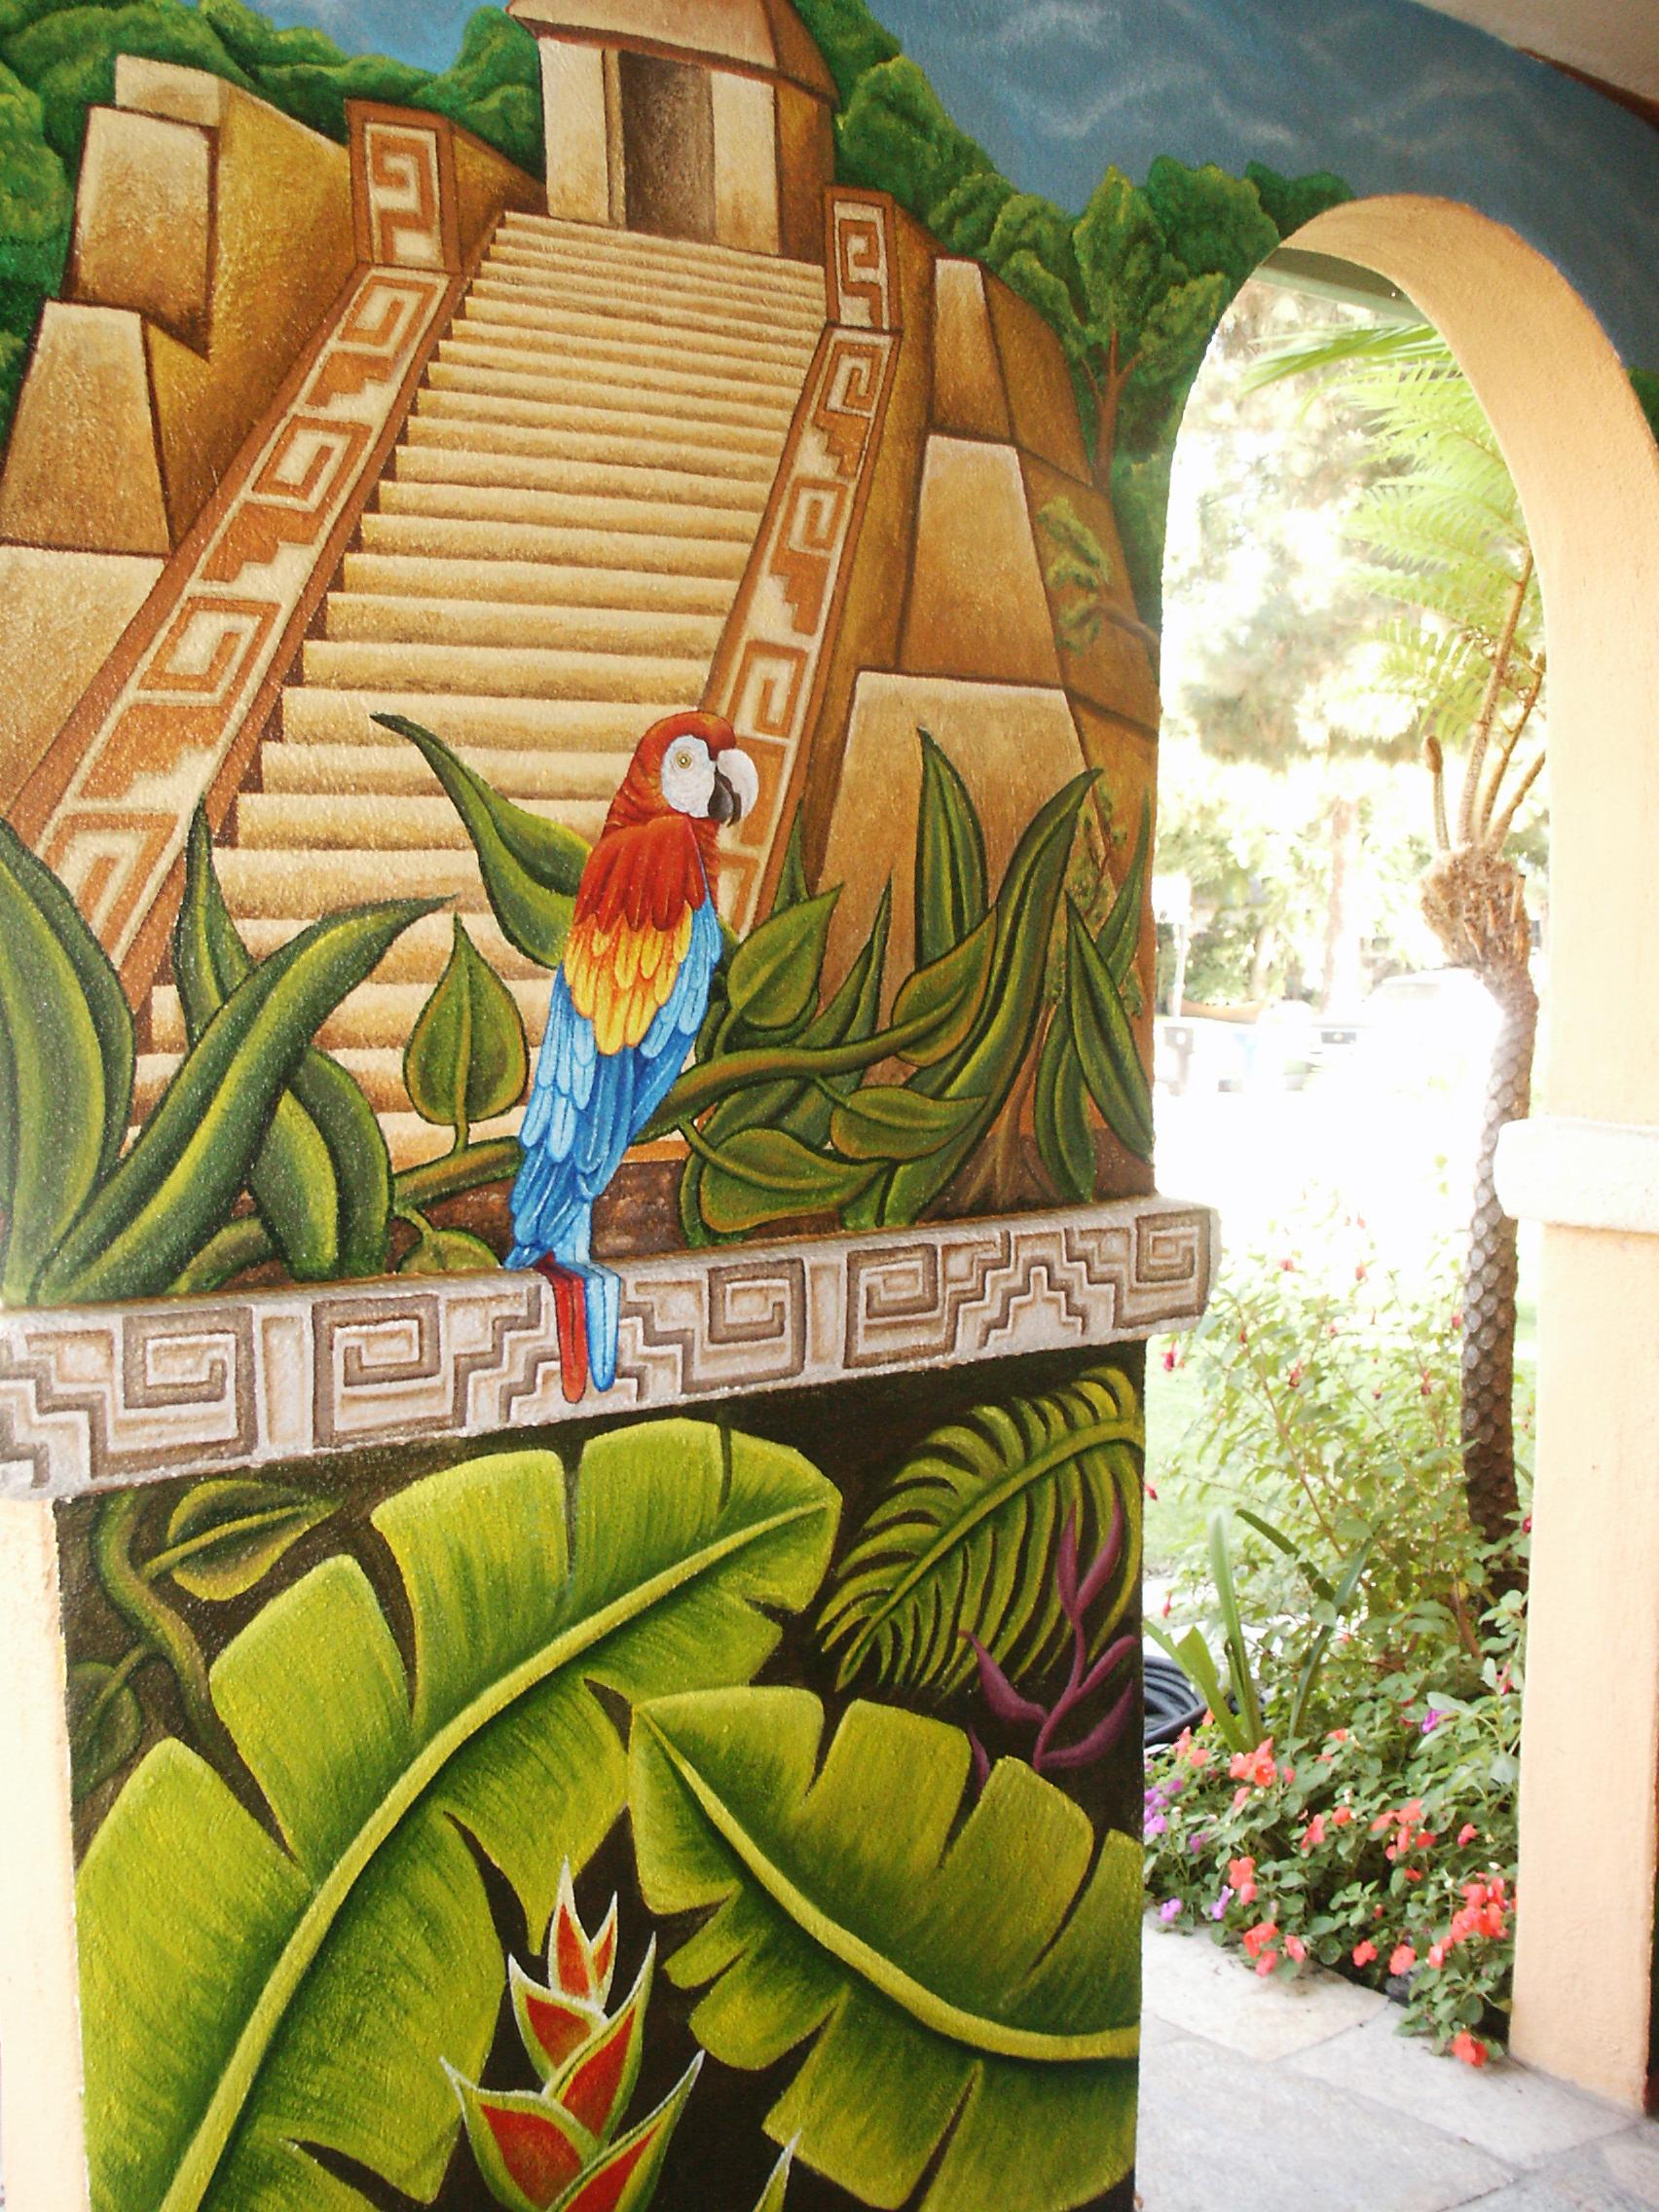 Murals and public art arte toltecayotl for Mural joe painting